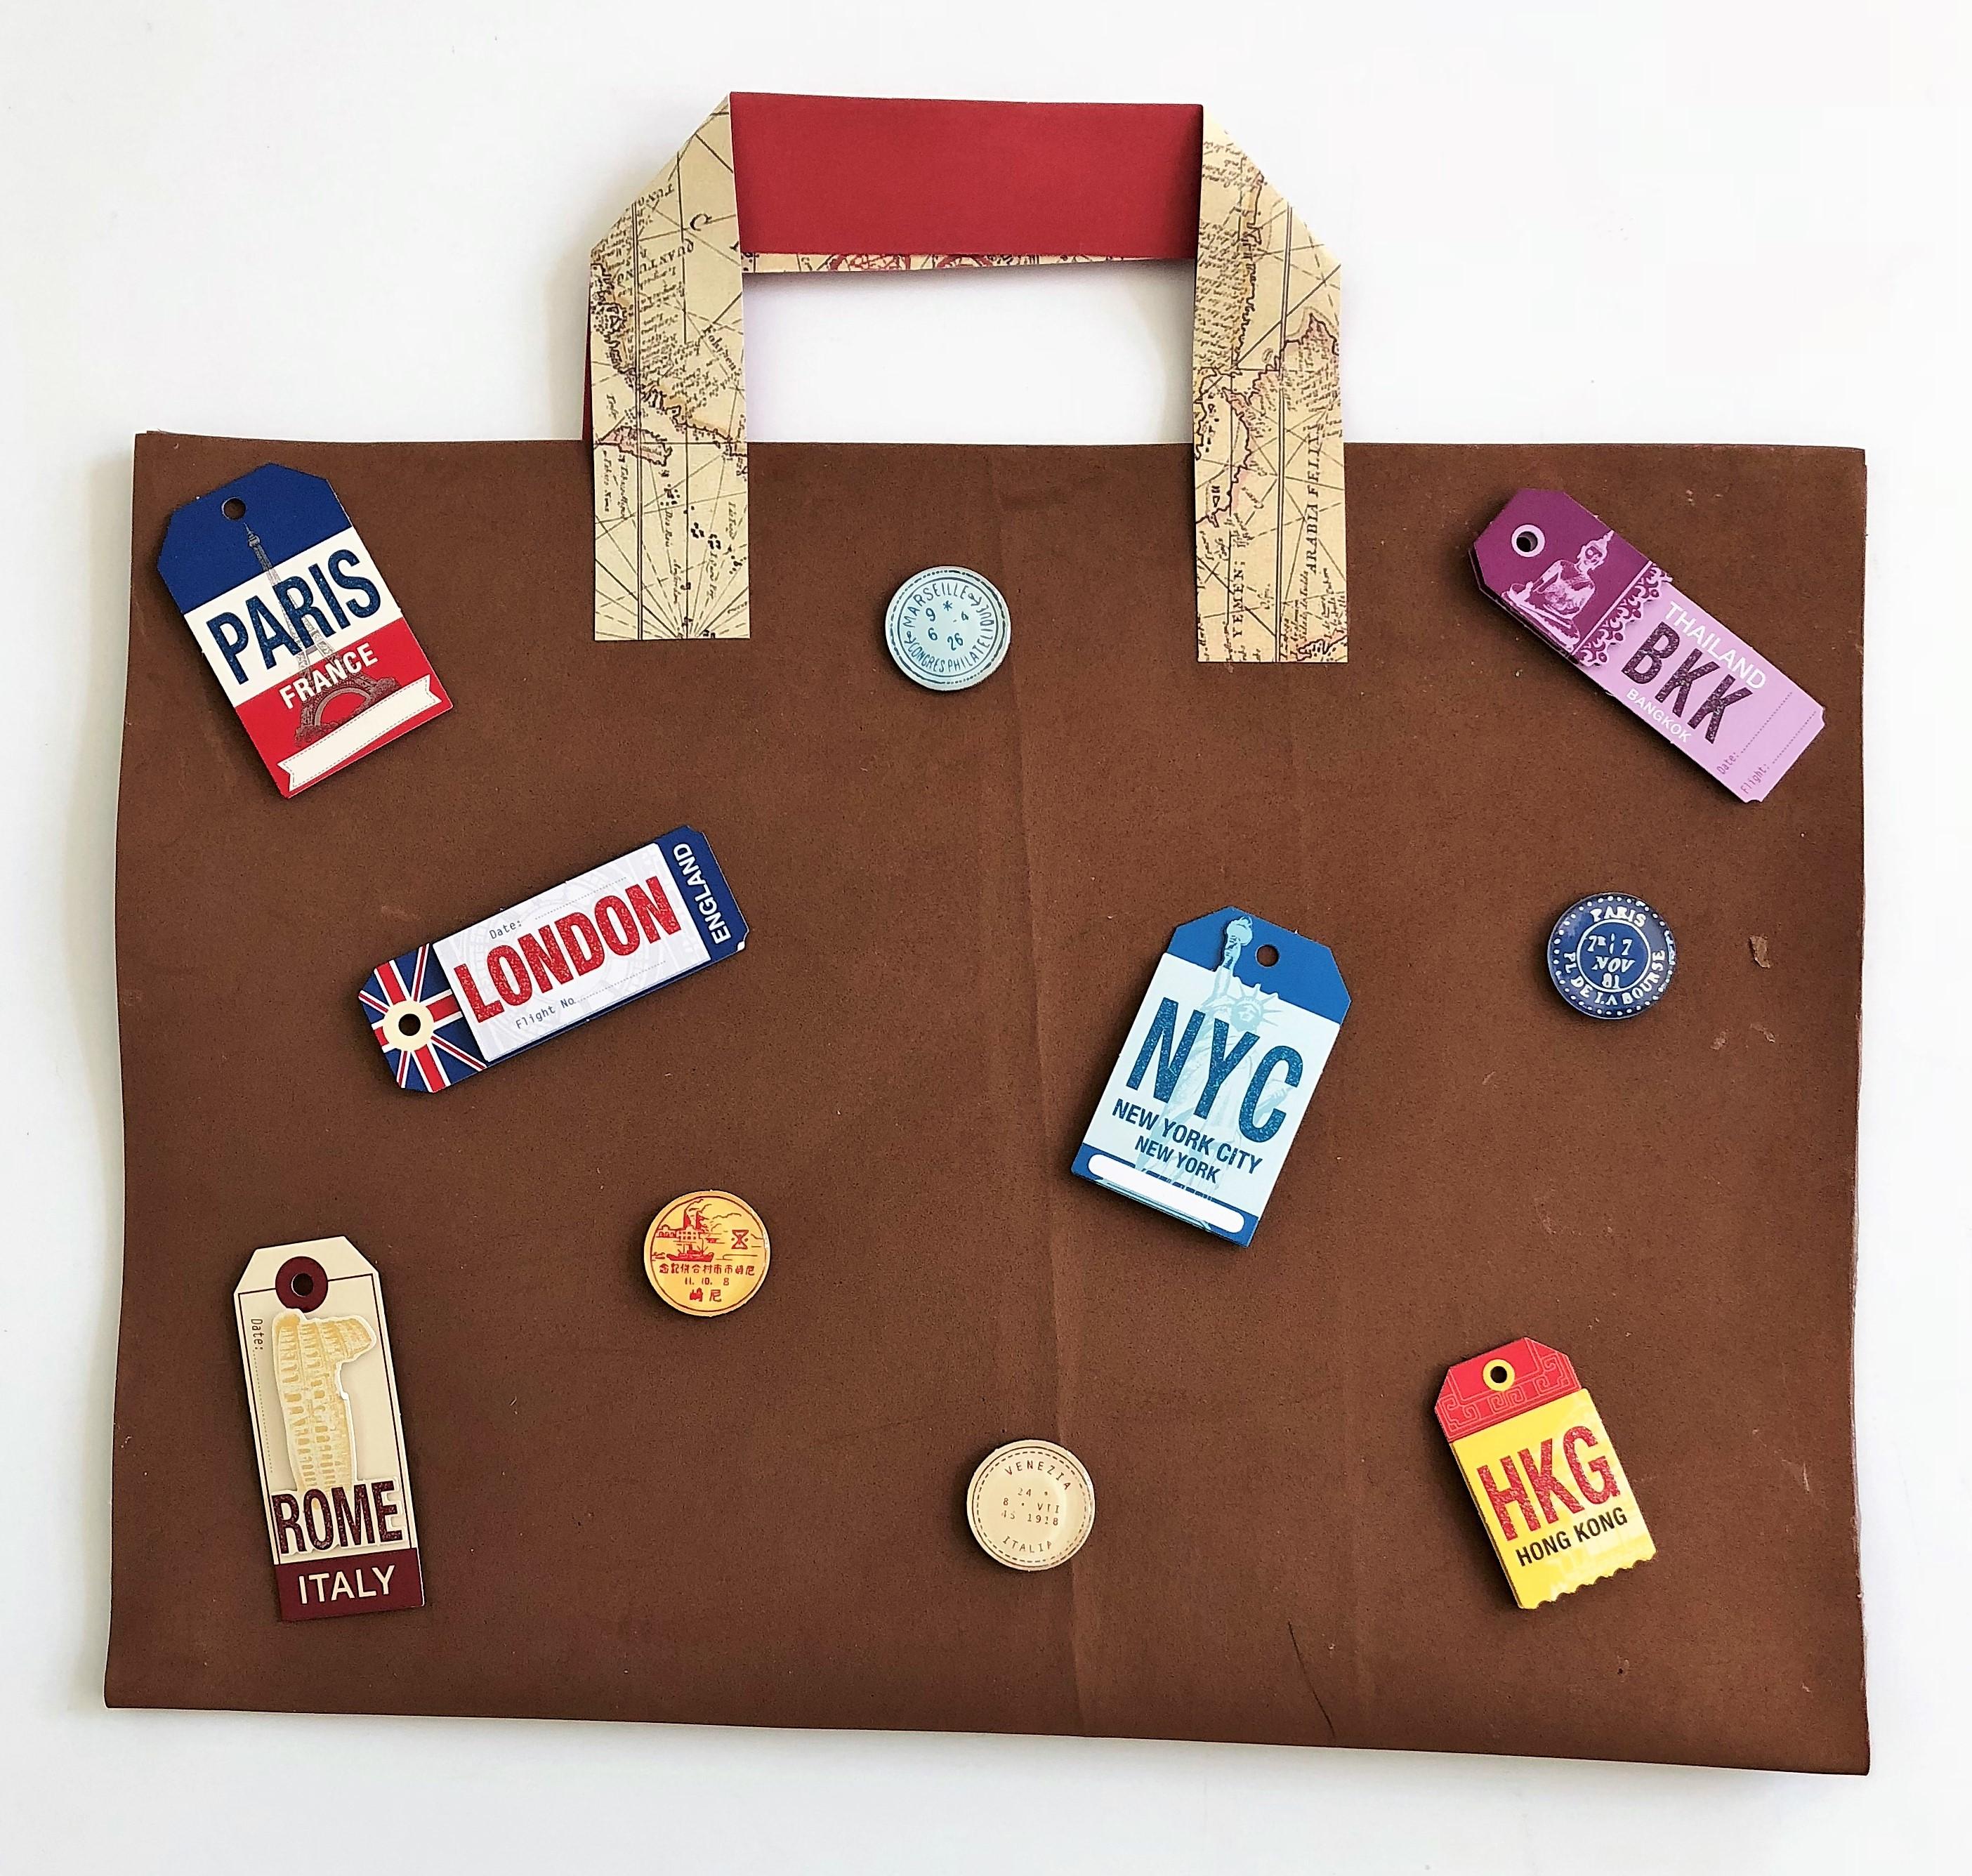 celebrate-picture-books-picture-book-review-foam-travel-suitcase